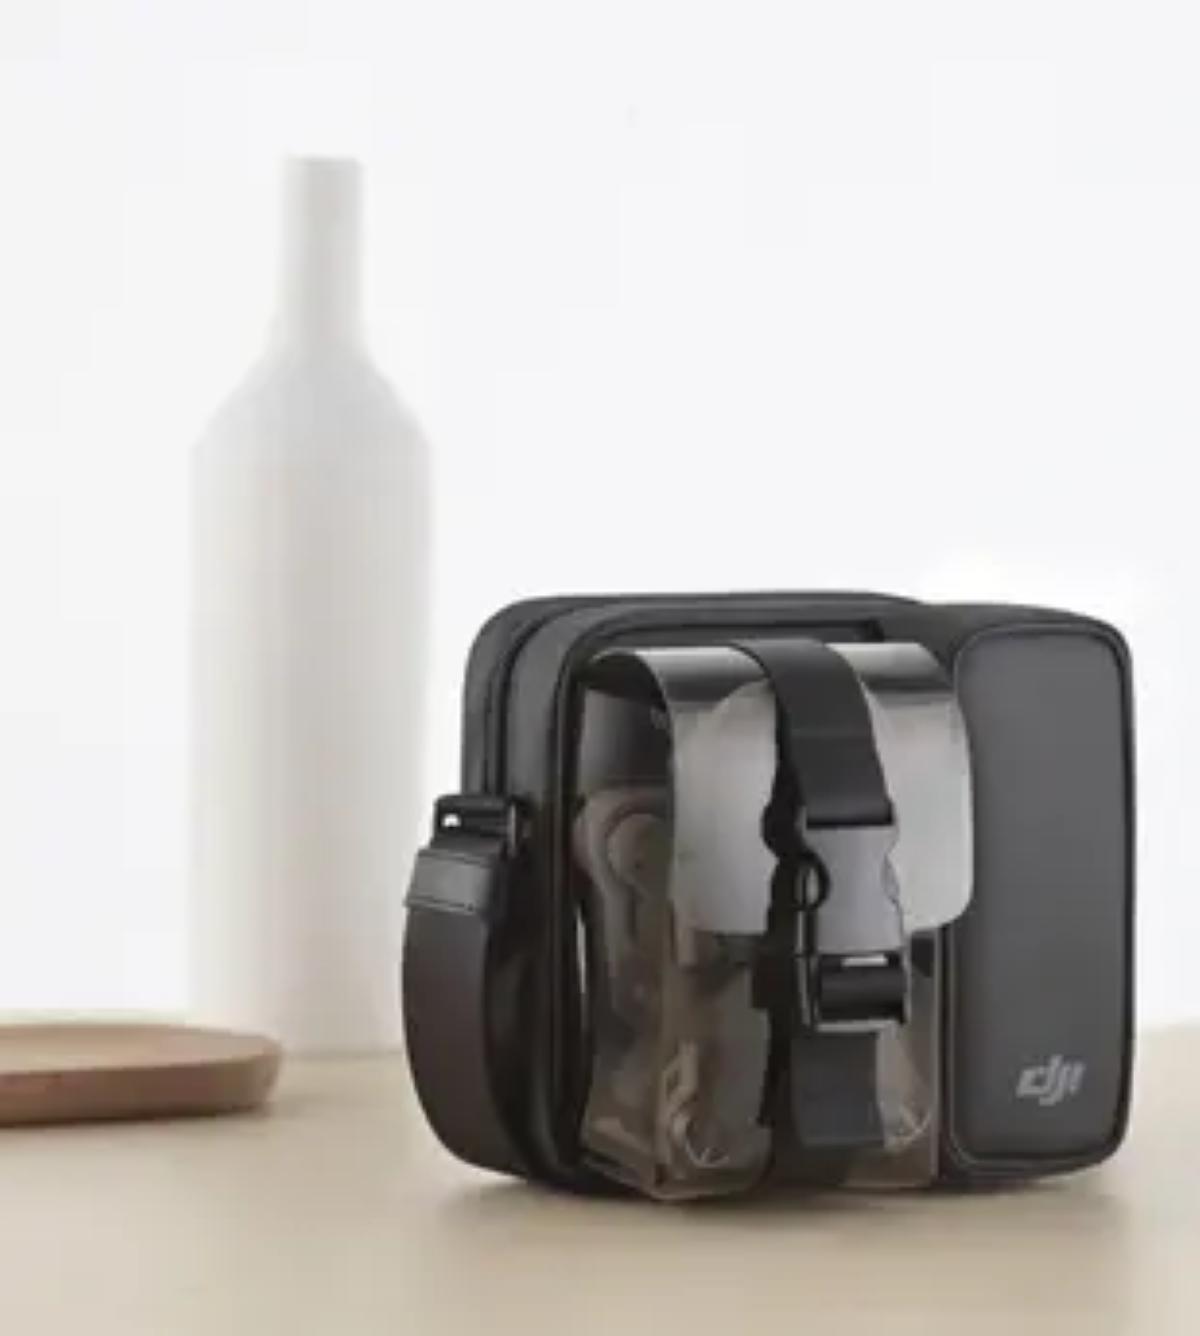 Mavic Mini - Accessories - Carrying Bag